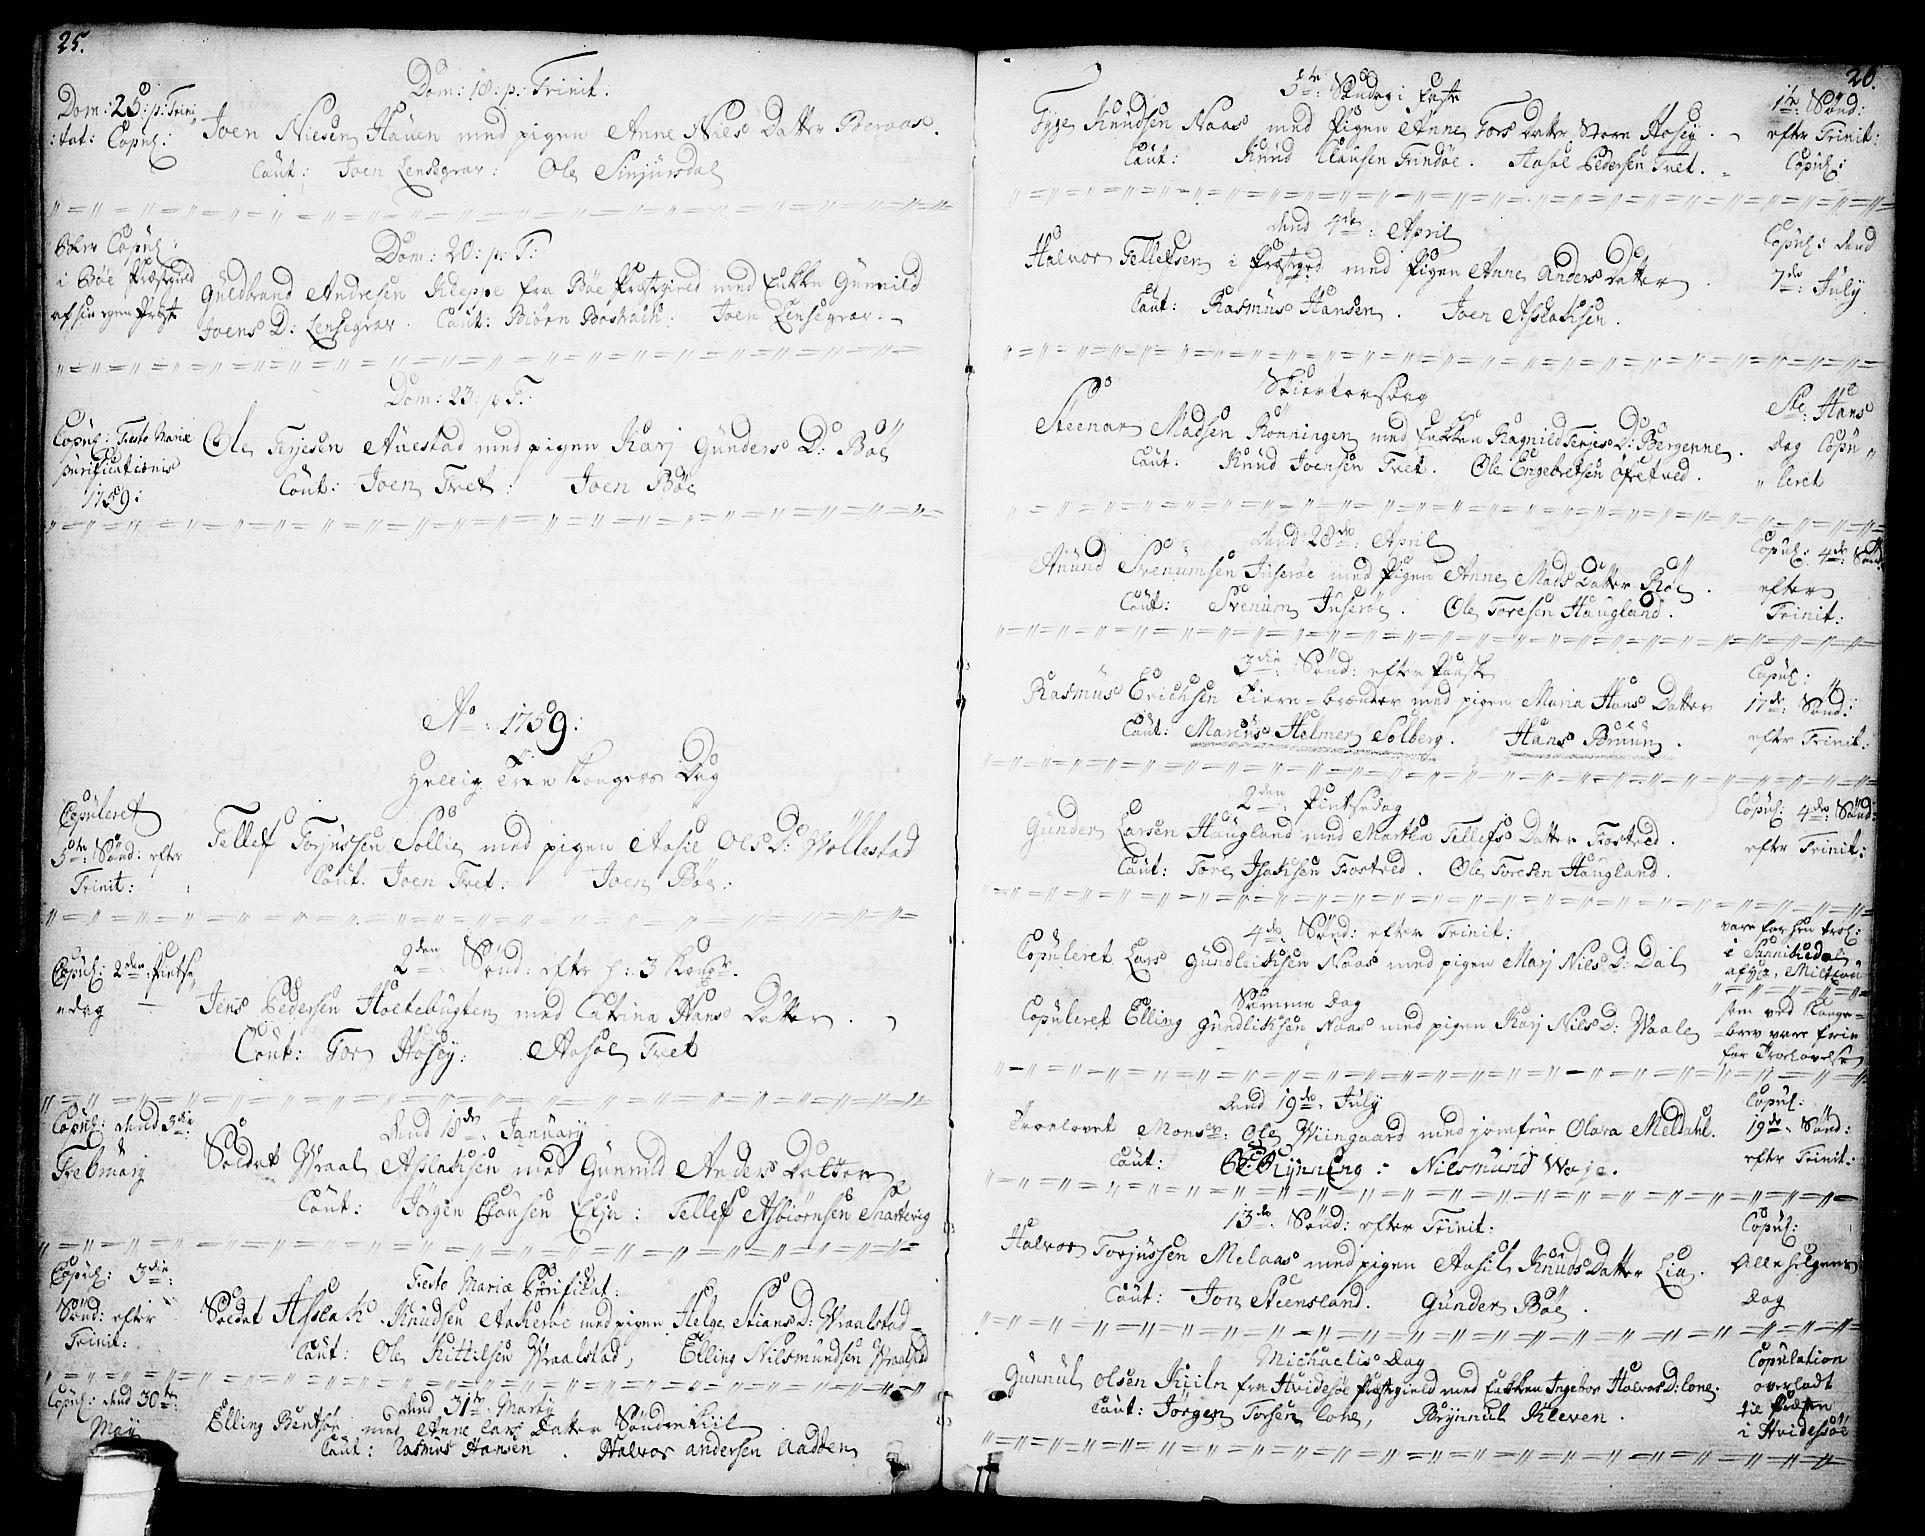 SAKO, Drangedal kirkebøker, F/Fa/L0001: Ministerialbok nr. 1, 1697-1767, s. 25-26